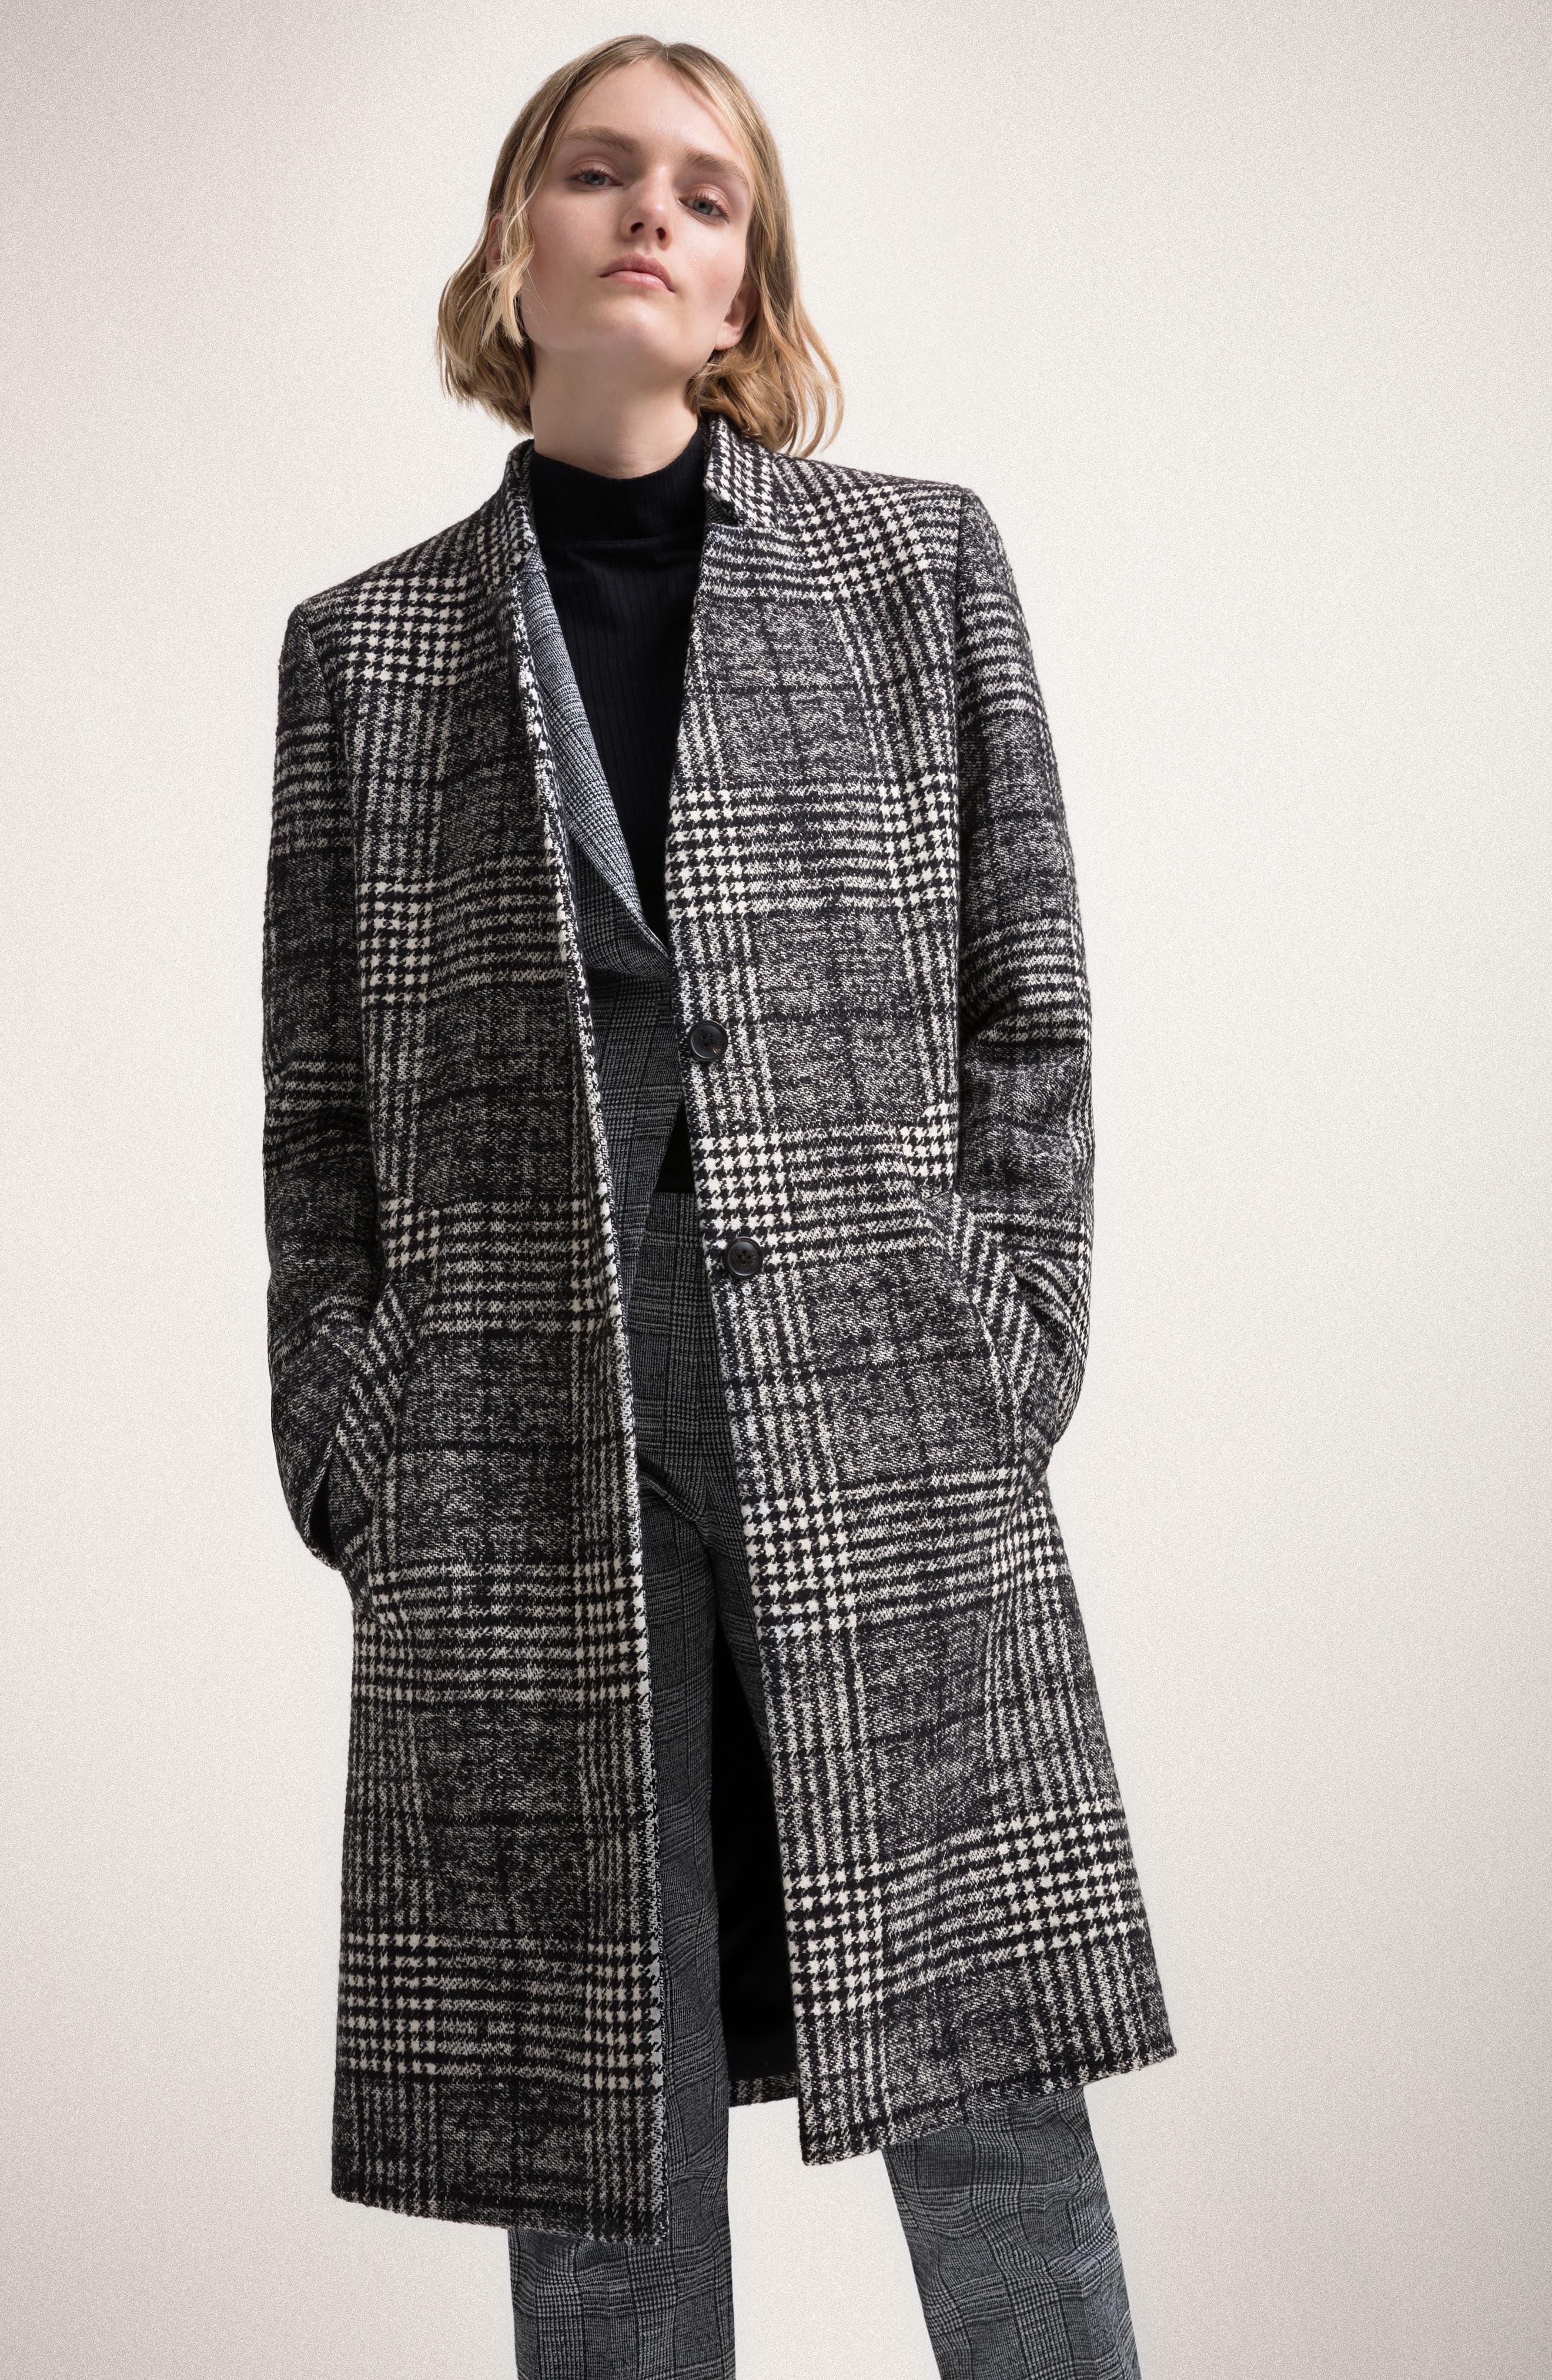 Magrete Bold Check Stretch Cotton Wool Coat,                             Alternate thumbnail 7, color,                             BLACK/ WHITE